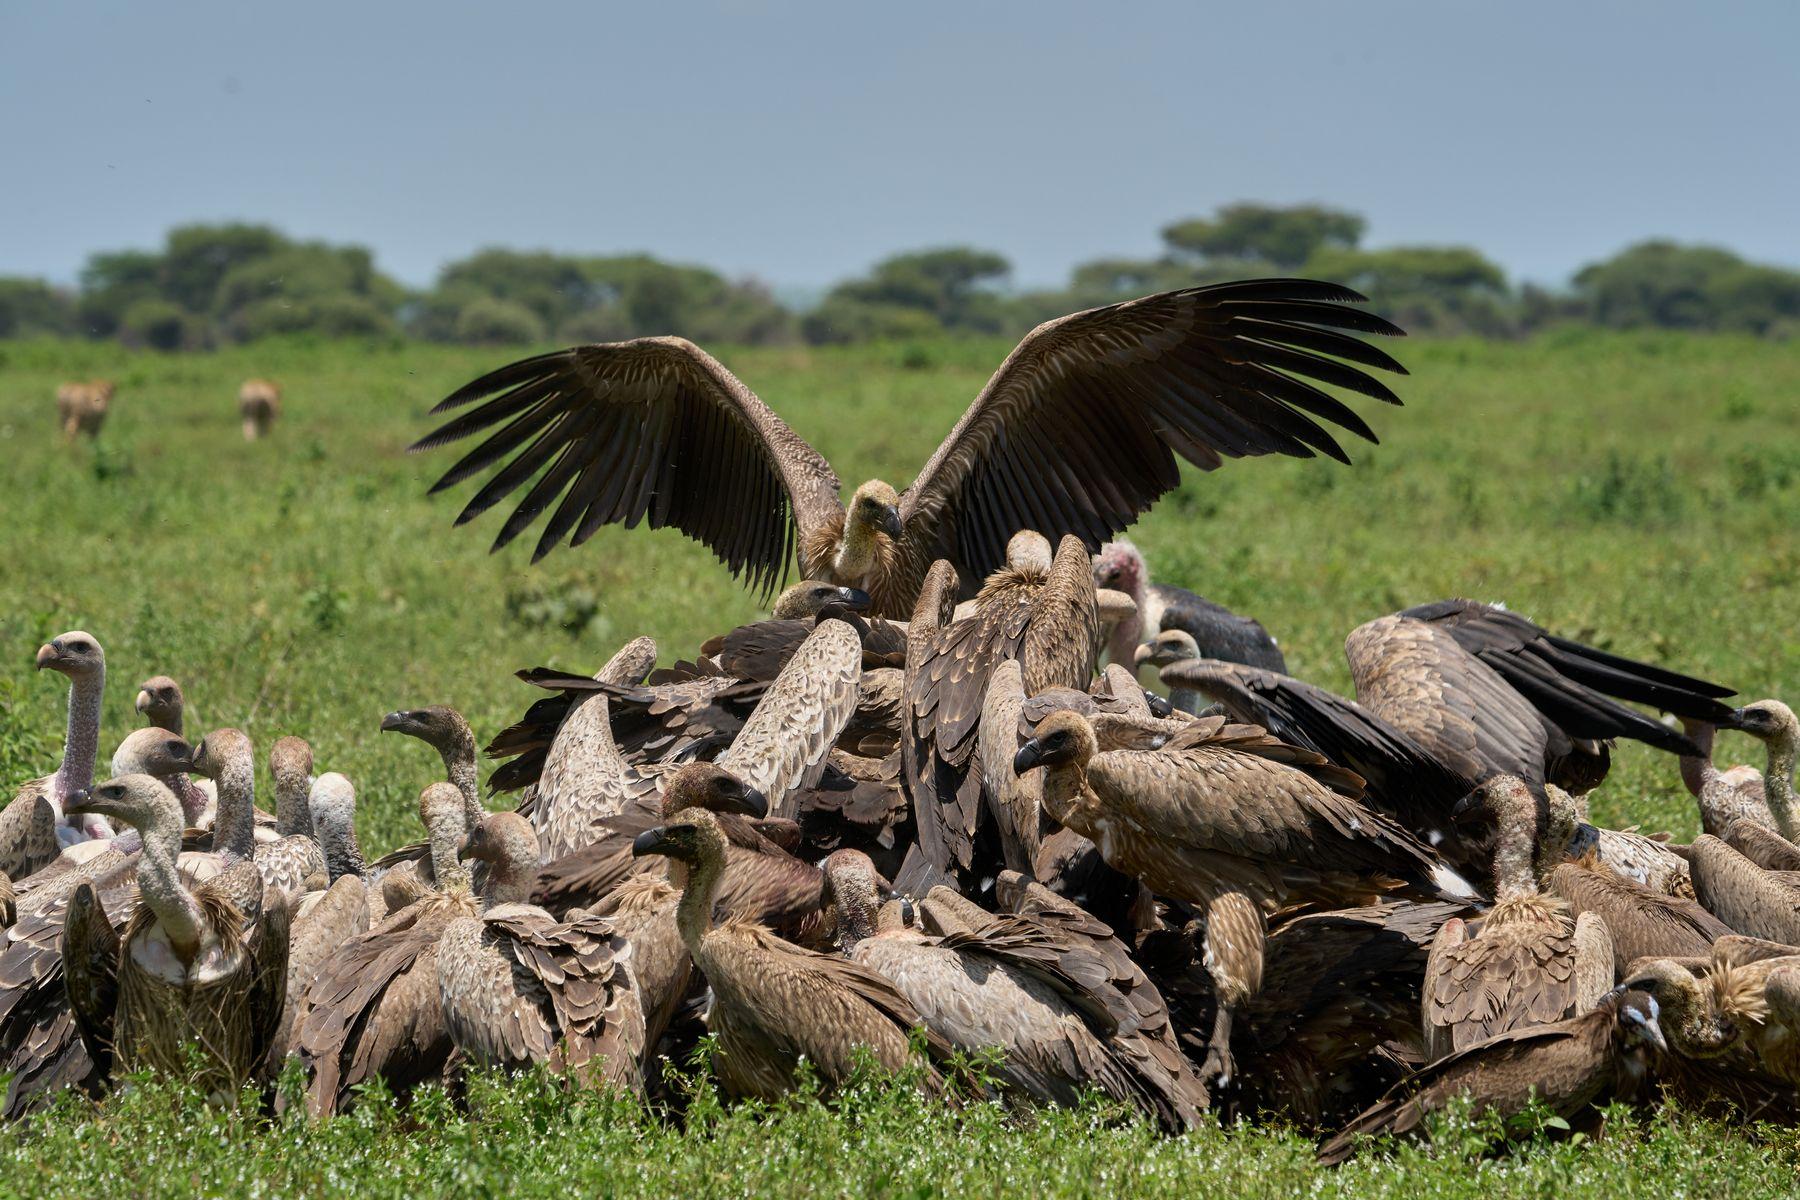 Грифы доедают за гепардами антилопу гну Танзания Нгоронгоро Африка природа птицы грифы